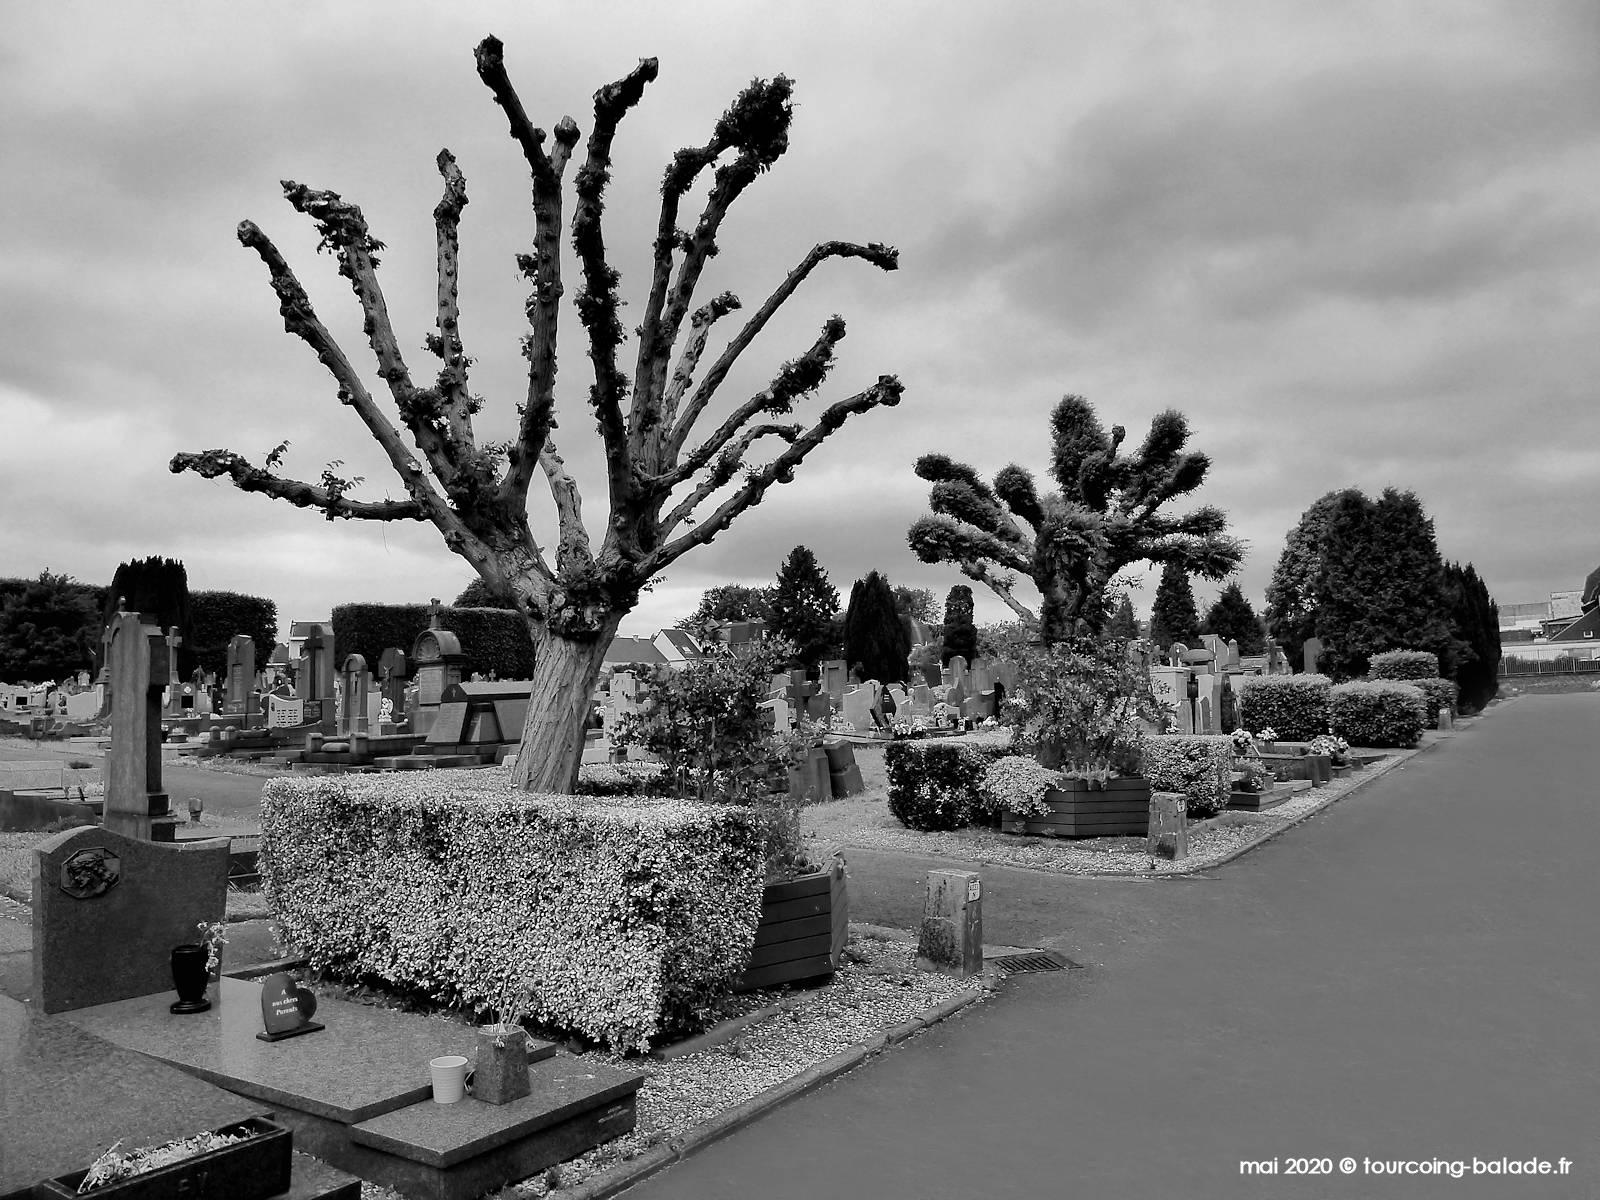 Joshua Tree, cimetière du Blanc Seau, Tourcoing 2020